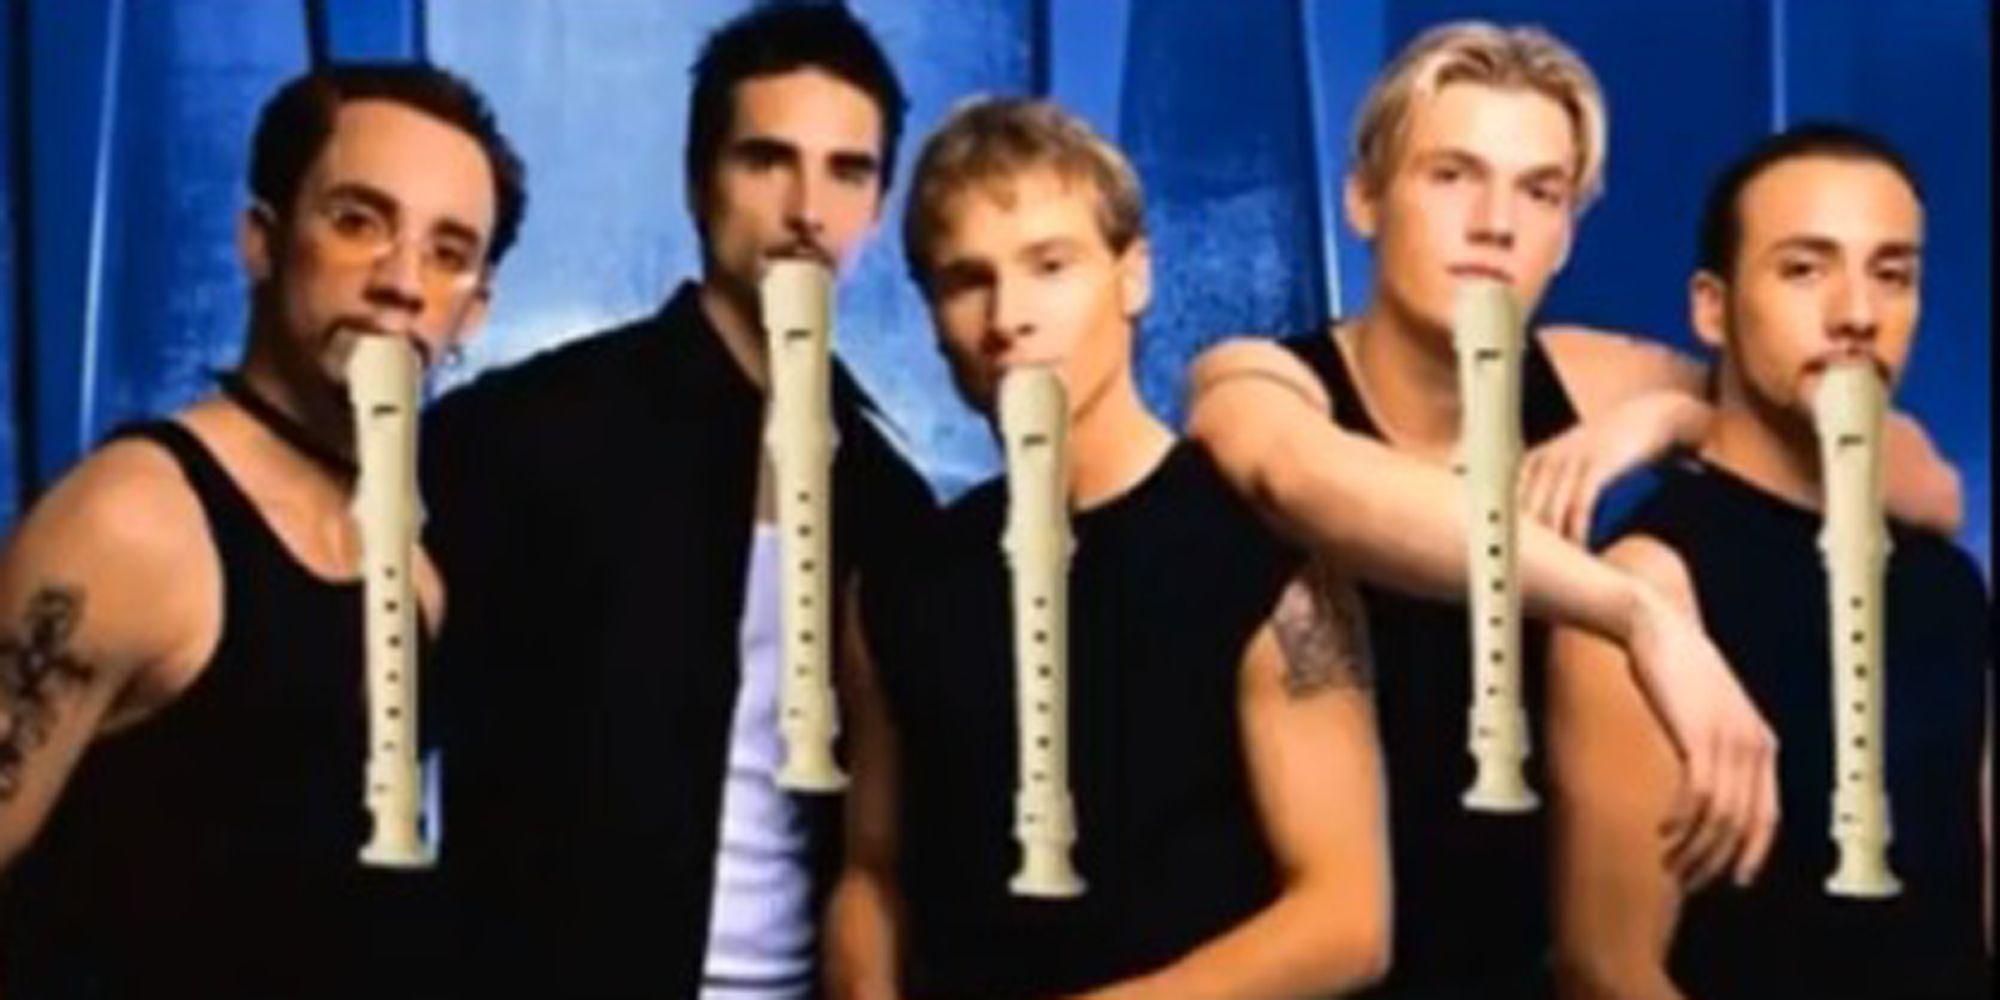 Shitty Flute Backstreet Boys Instagram